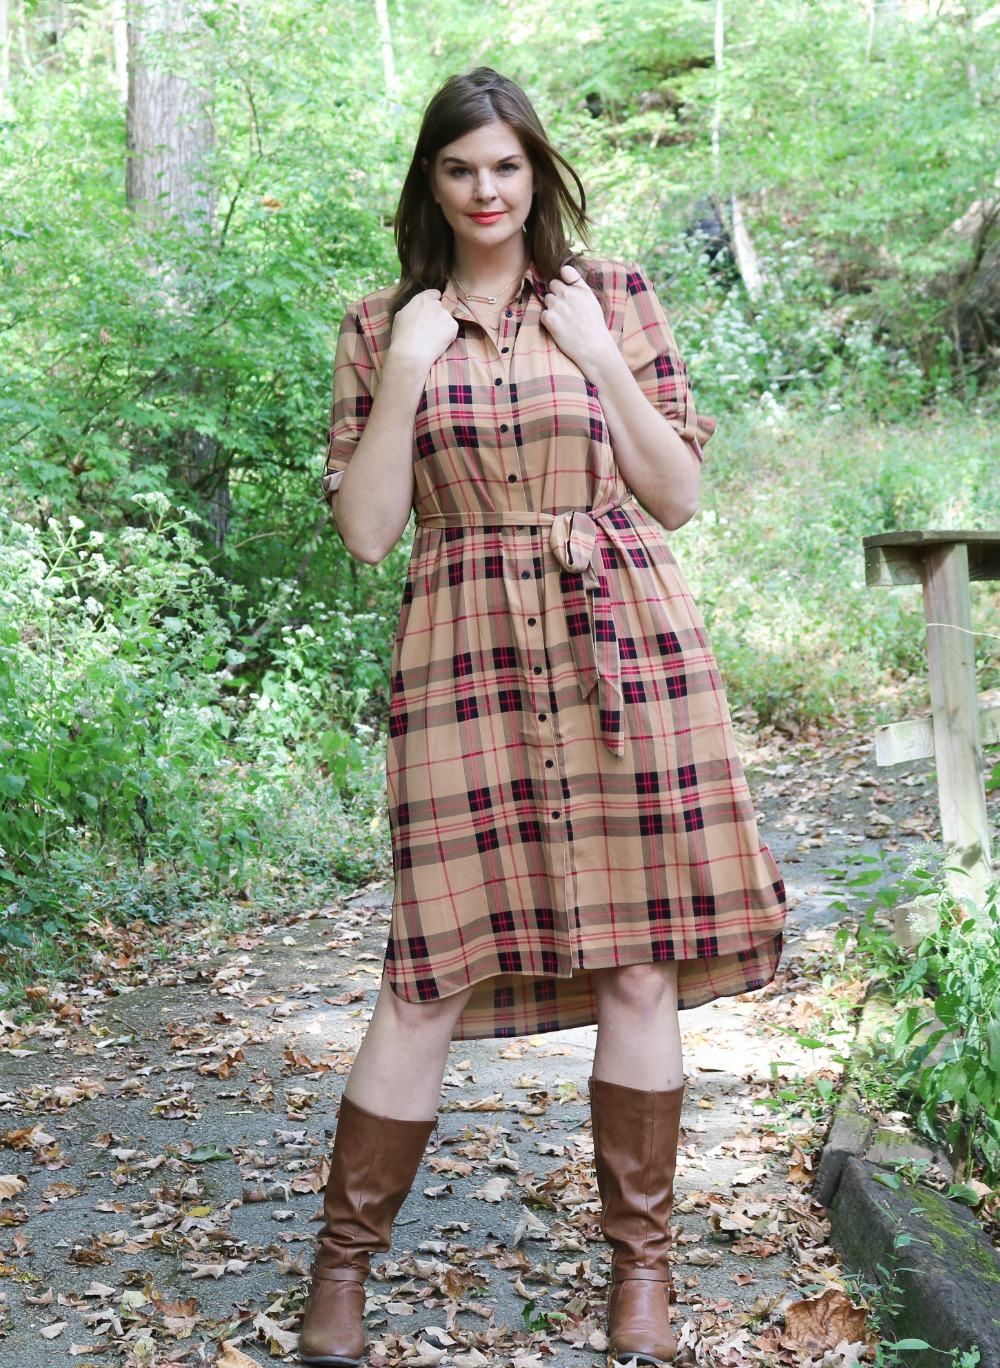 Plaid Styles for Fall 2019 I Fashion Blog DreaminLace.com #fallfashion #styleblog #styleinpso #fashionblogger #fashionista